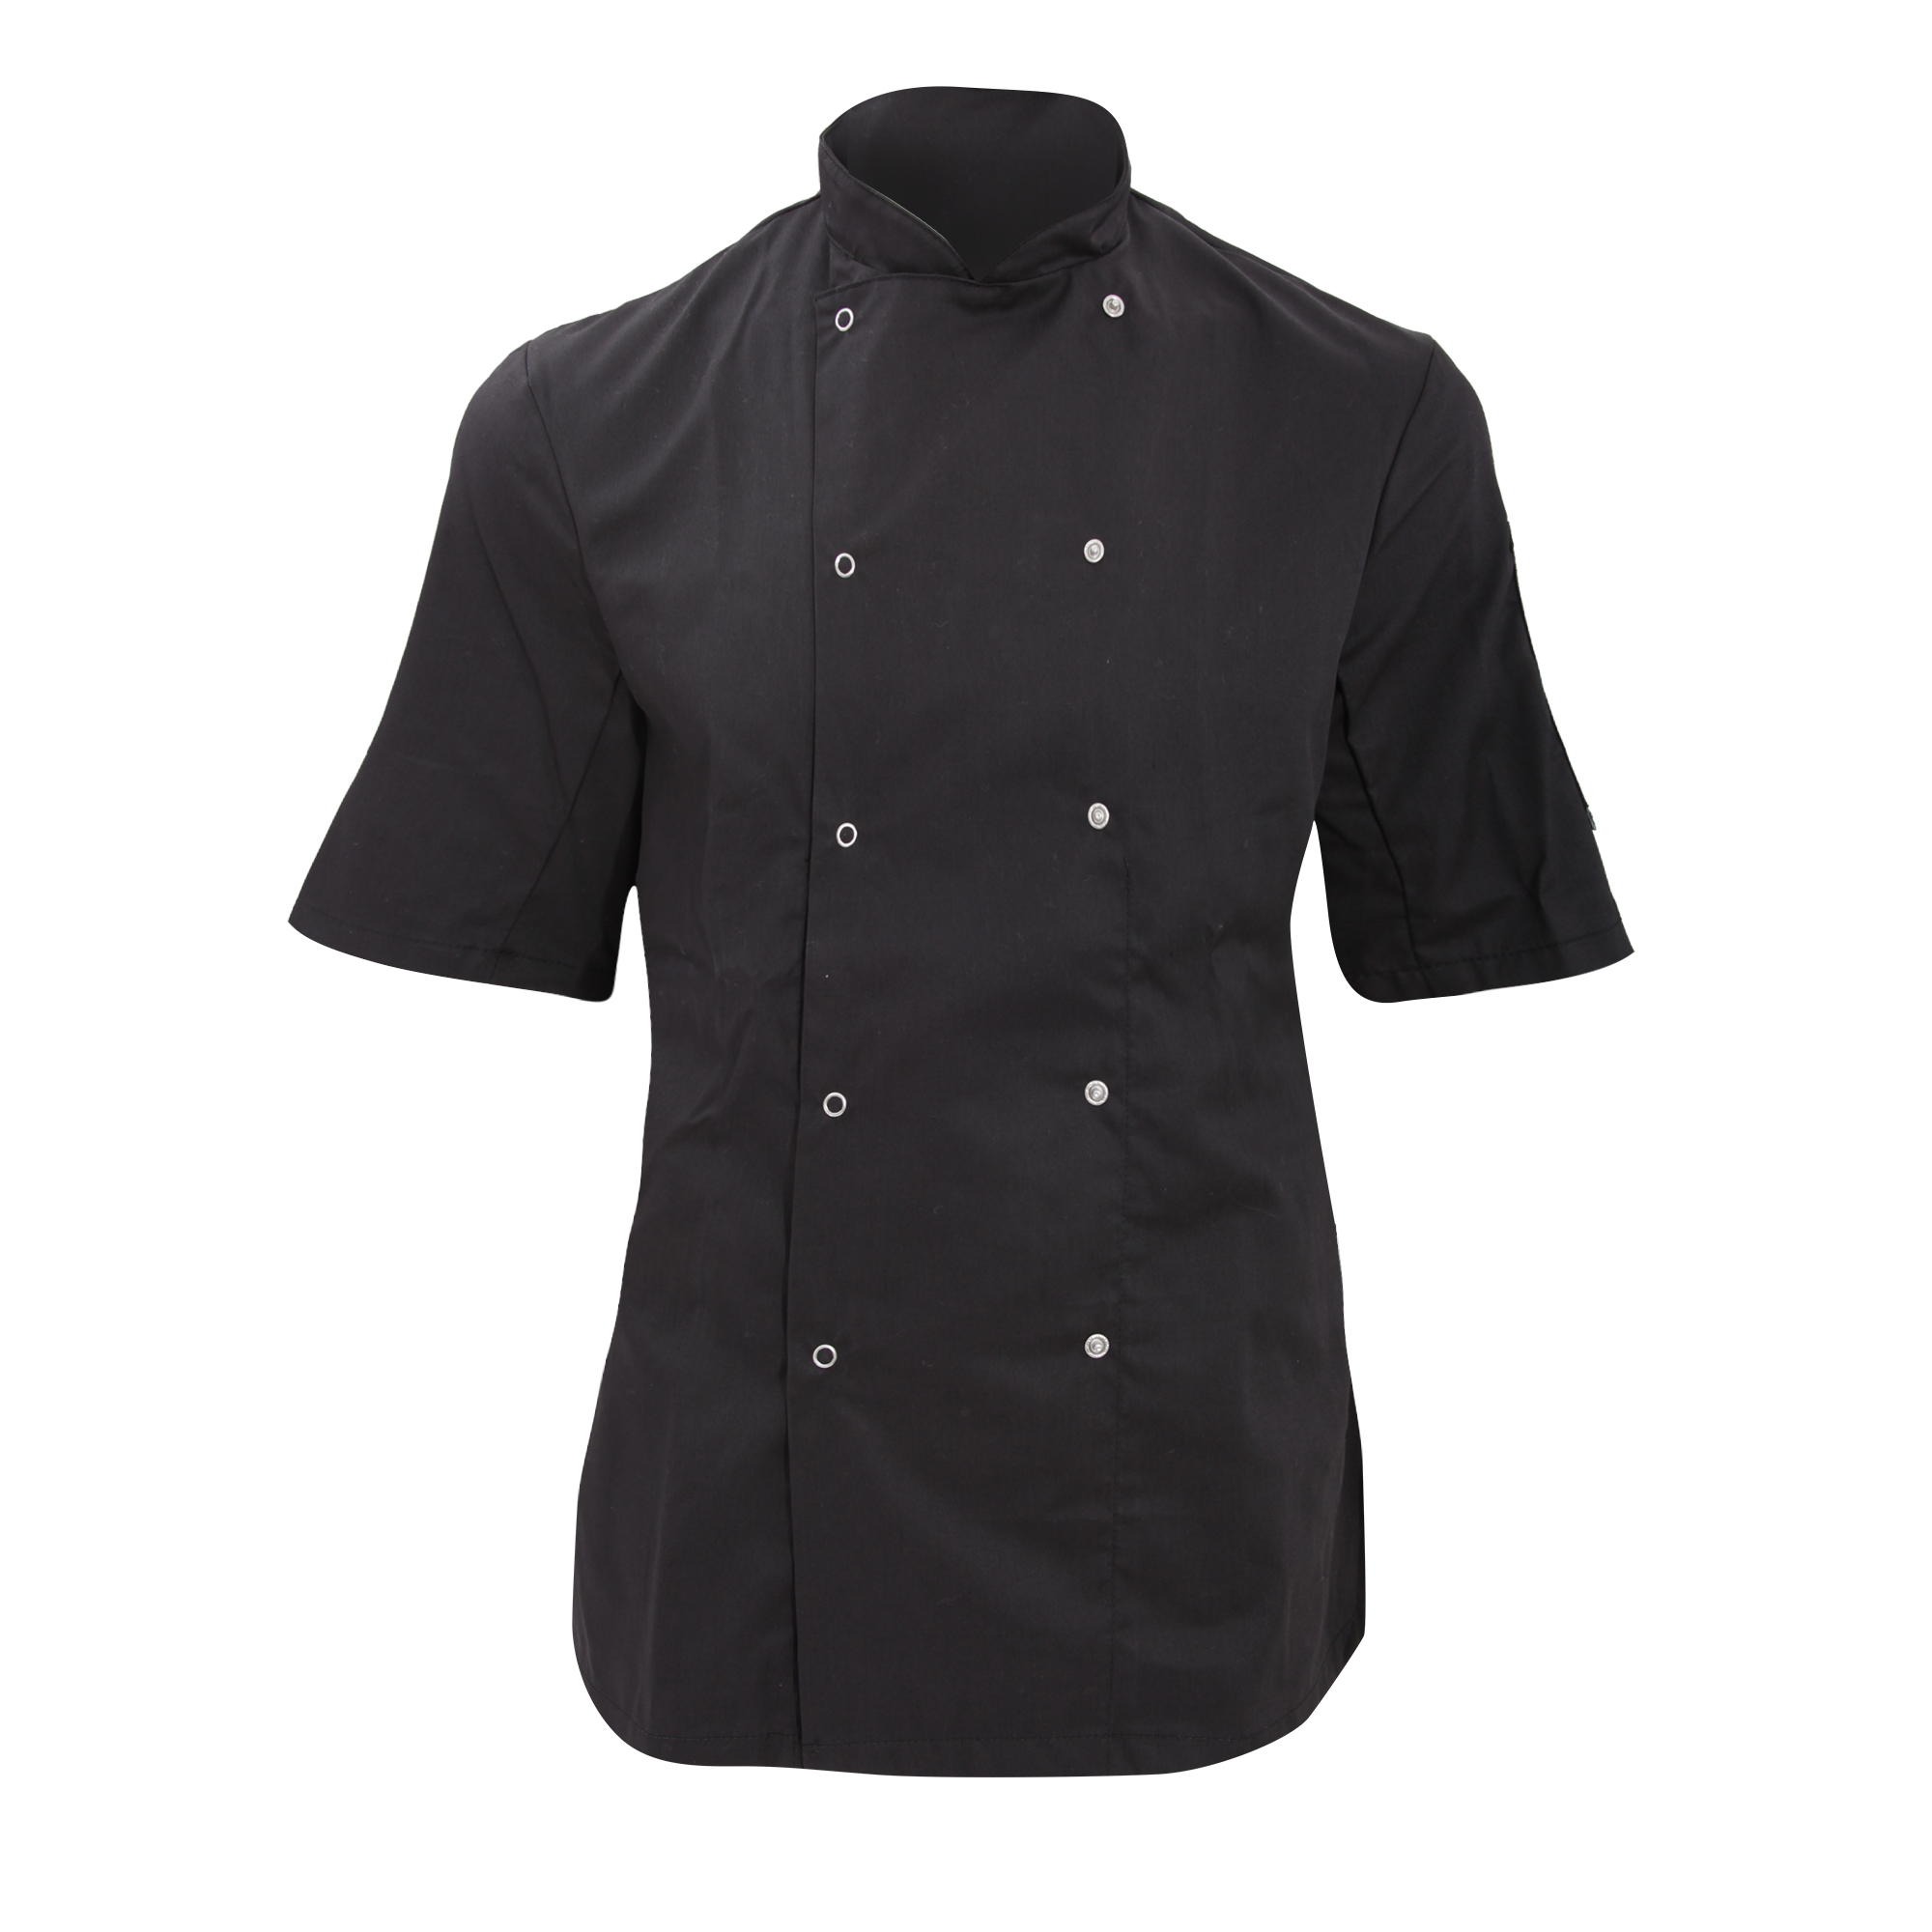 Dennys Womens/Ladies Economy Short Sleeve Chefs Jacket / Chefswear (XS) (Black)